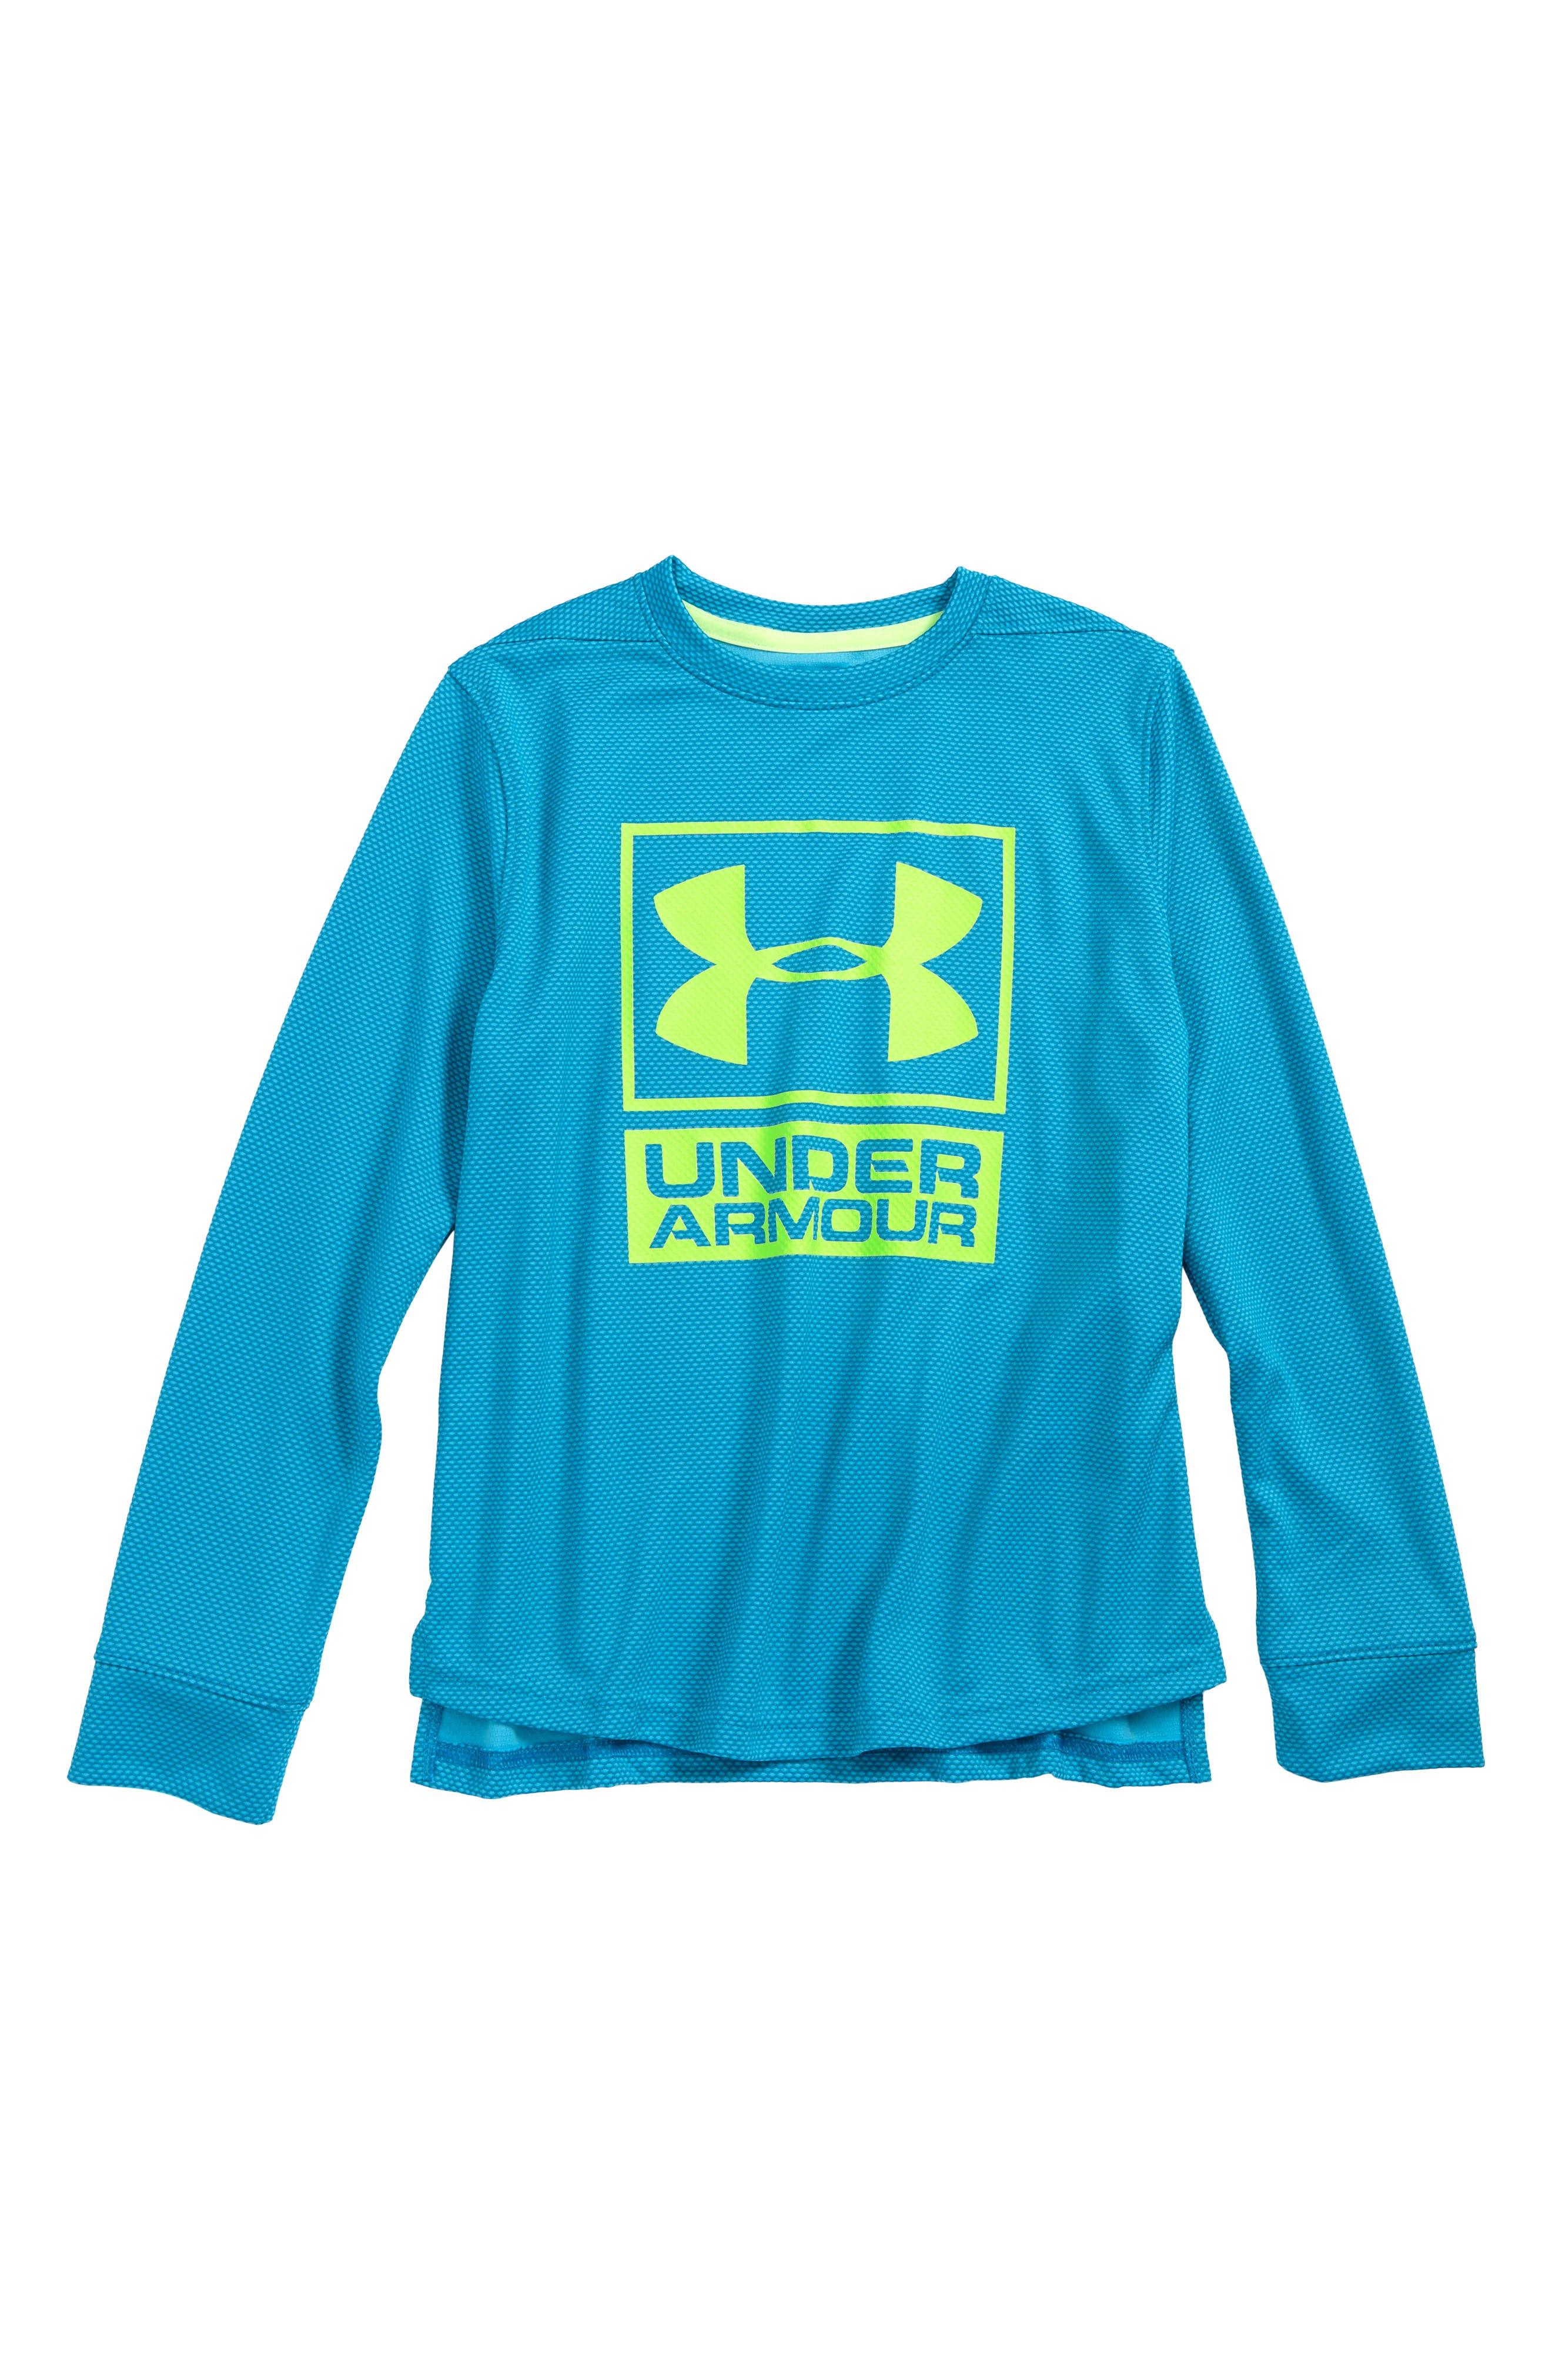 Logo Tech Shirt,                             Main thumbnail 1, color,                             Cruise Blue/ Quirky Lime